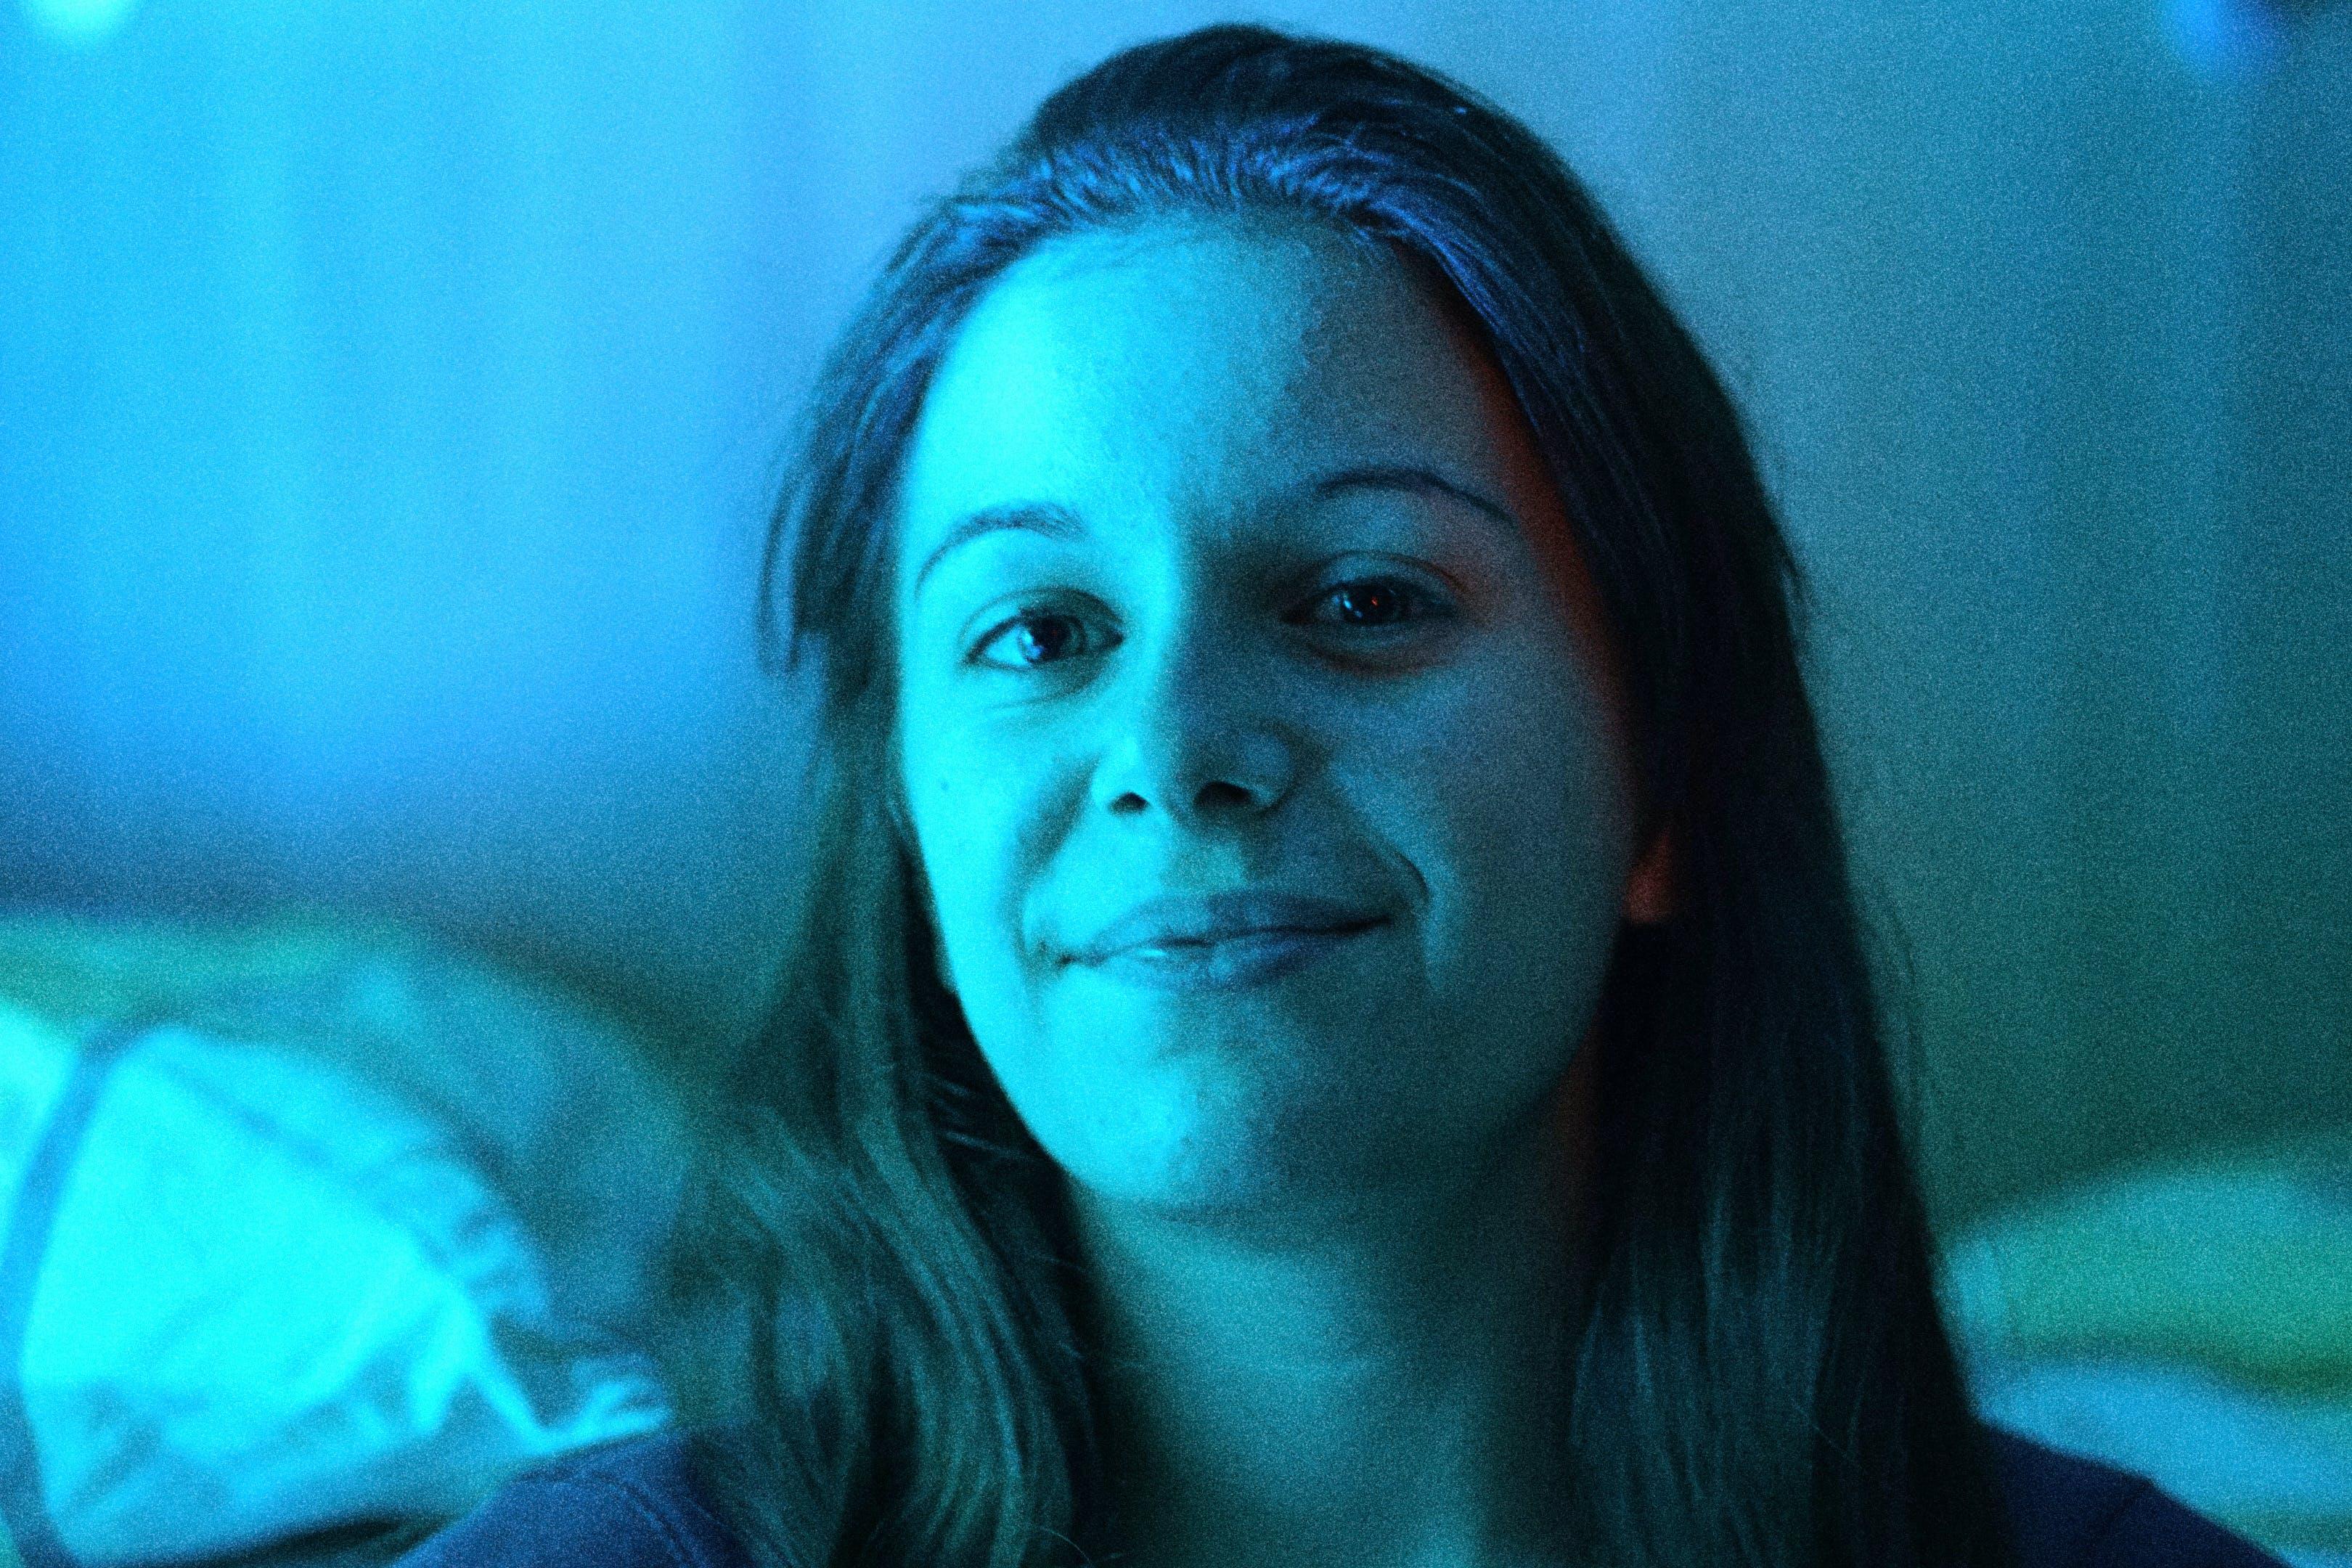 Free stock photo of blue, blue light, close-up, eyes